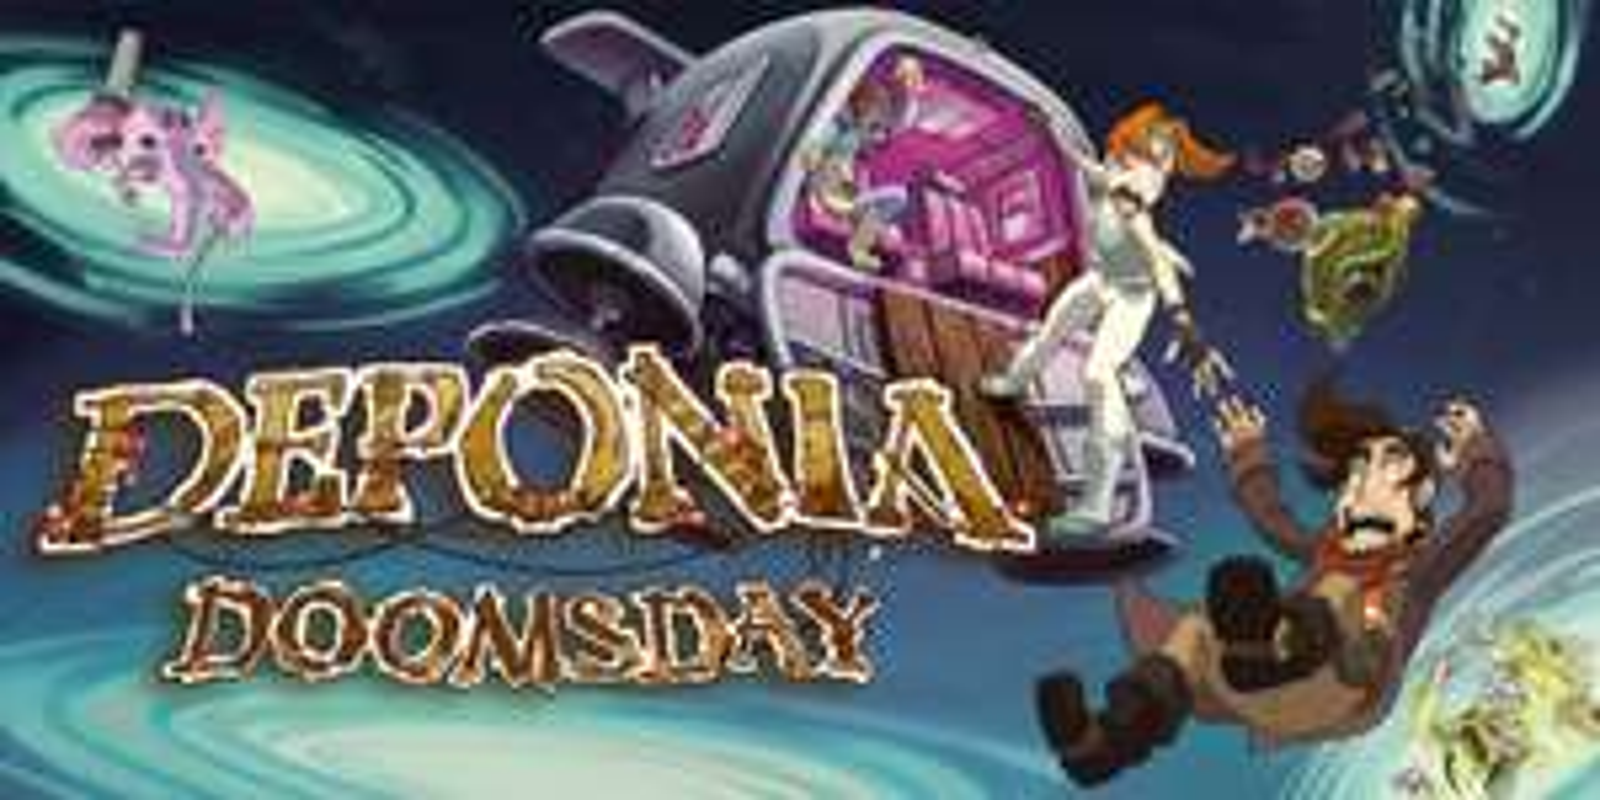 Deponia Doomsday - Nintendo Switch eshop £1.79